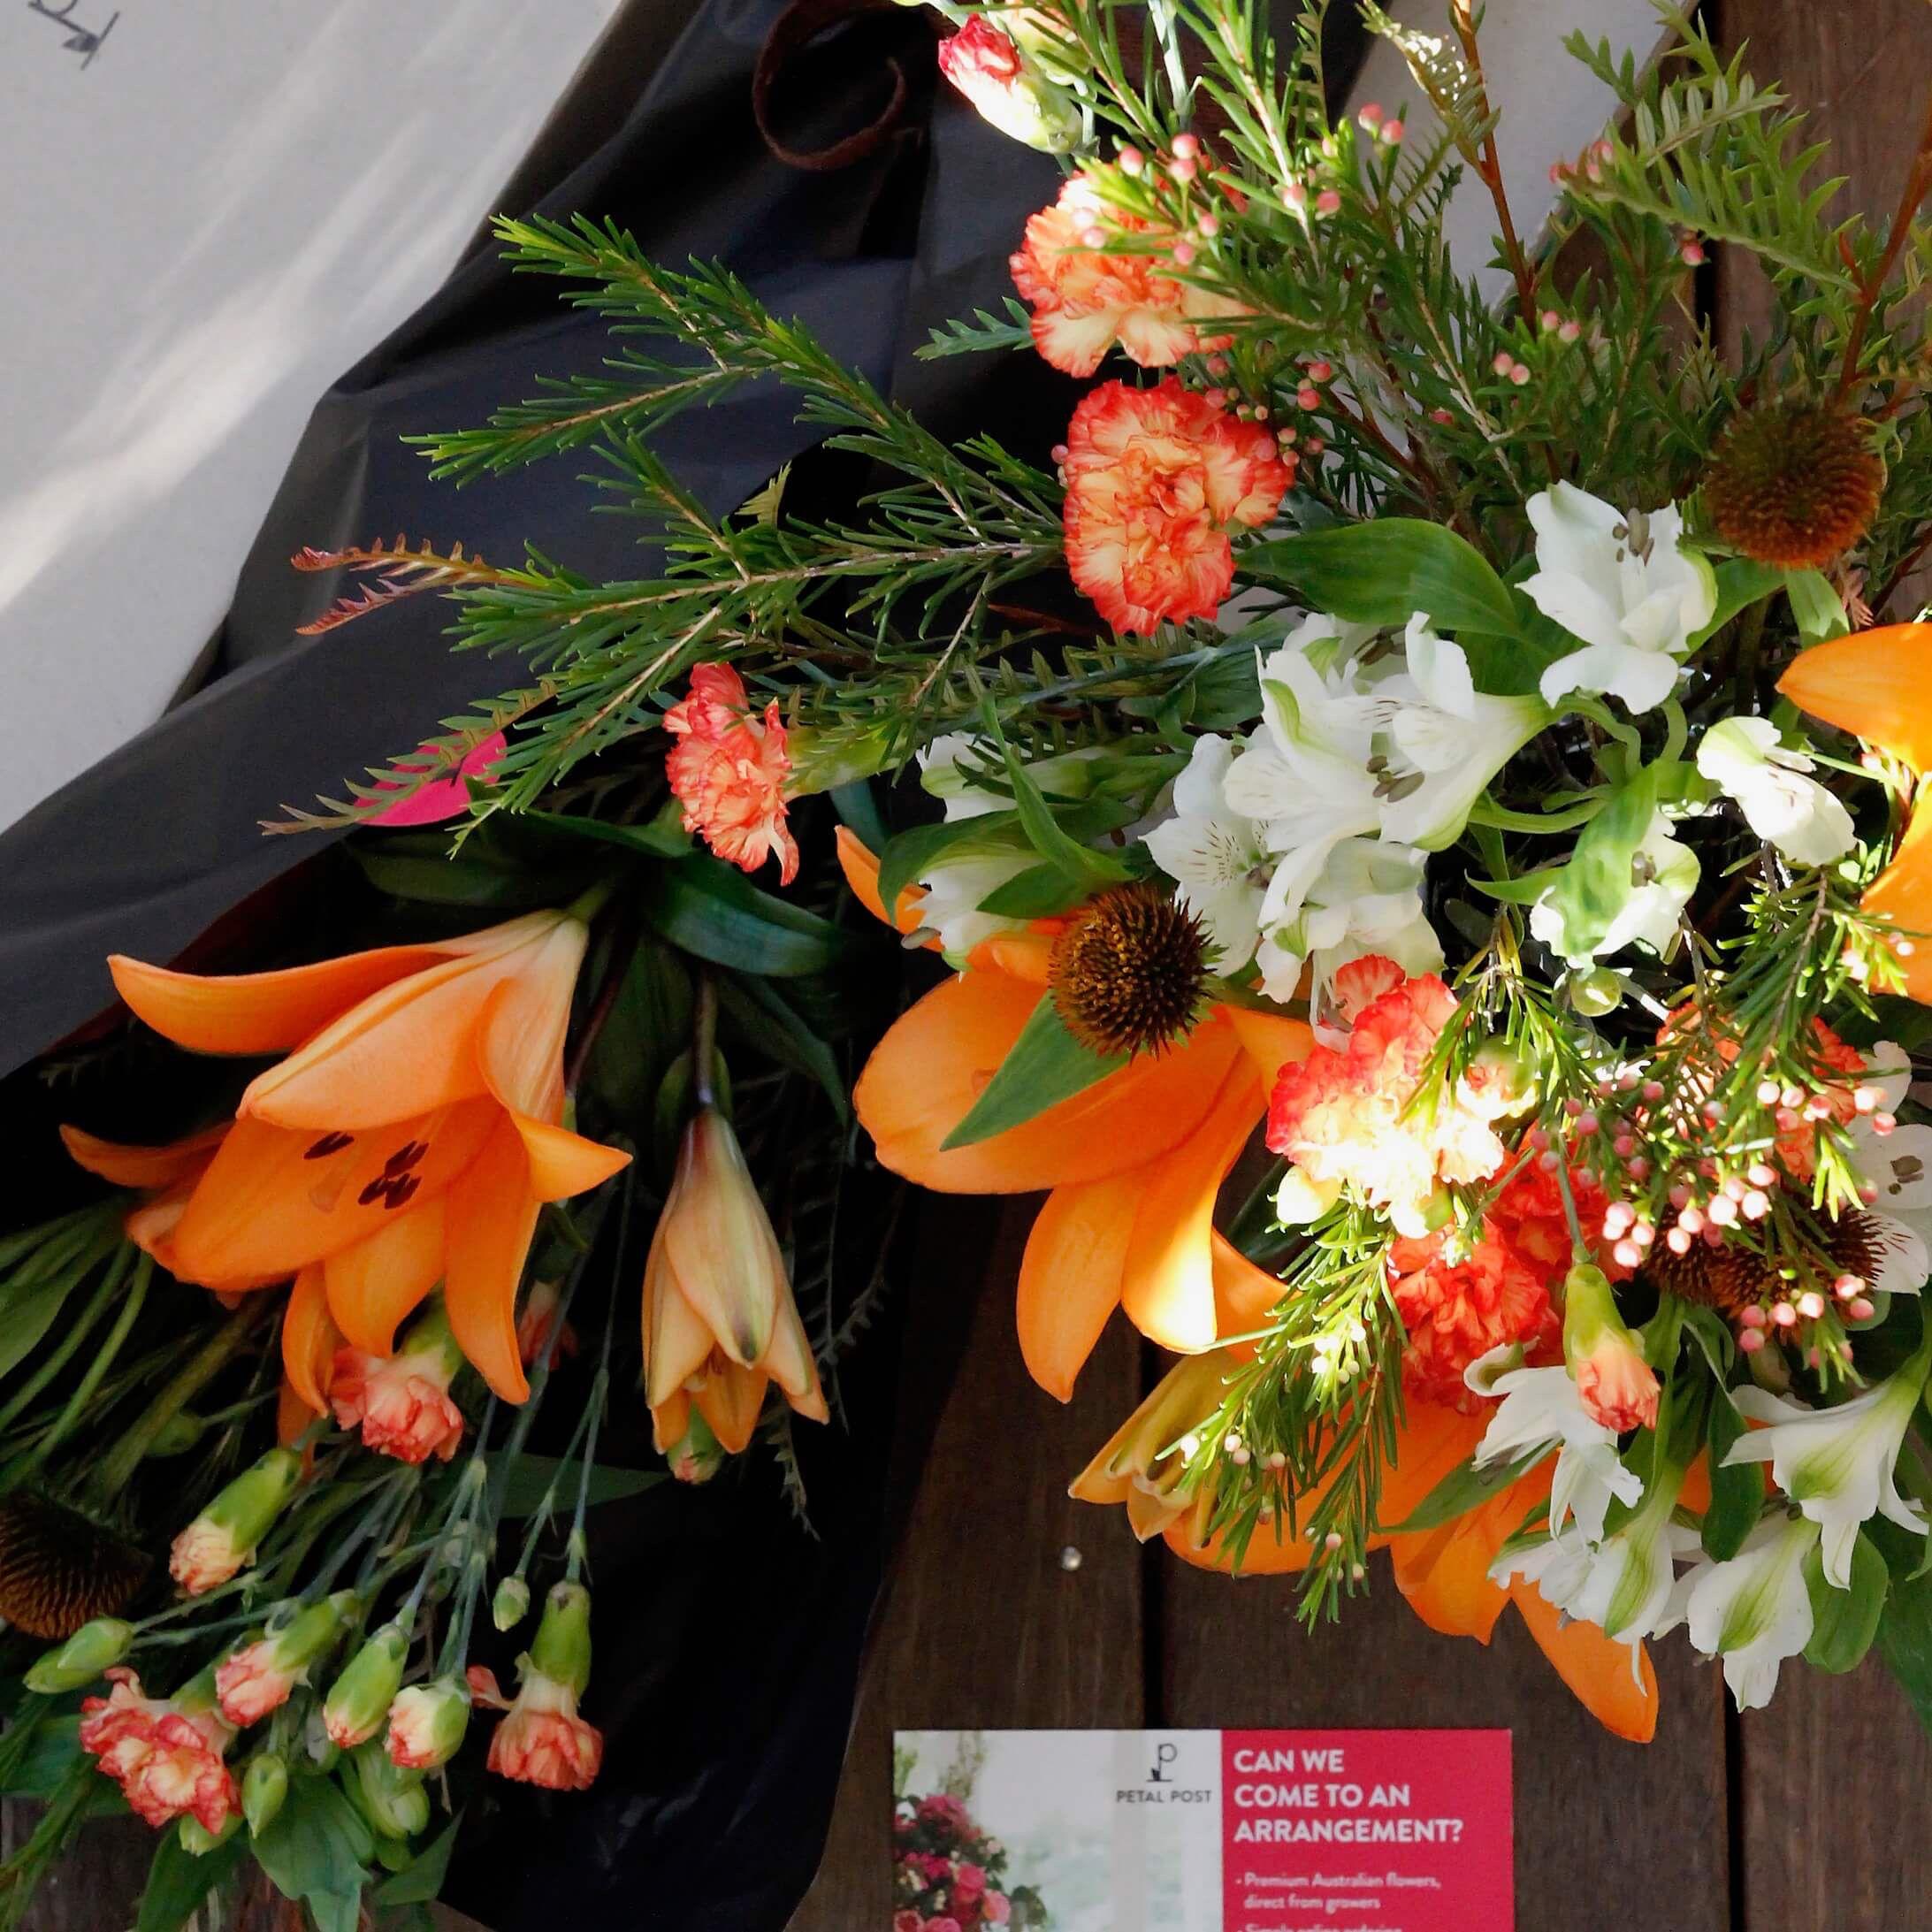 Flower delivery Sydney Flower service, Flower delivery